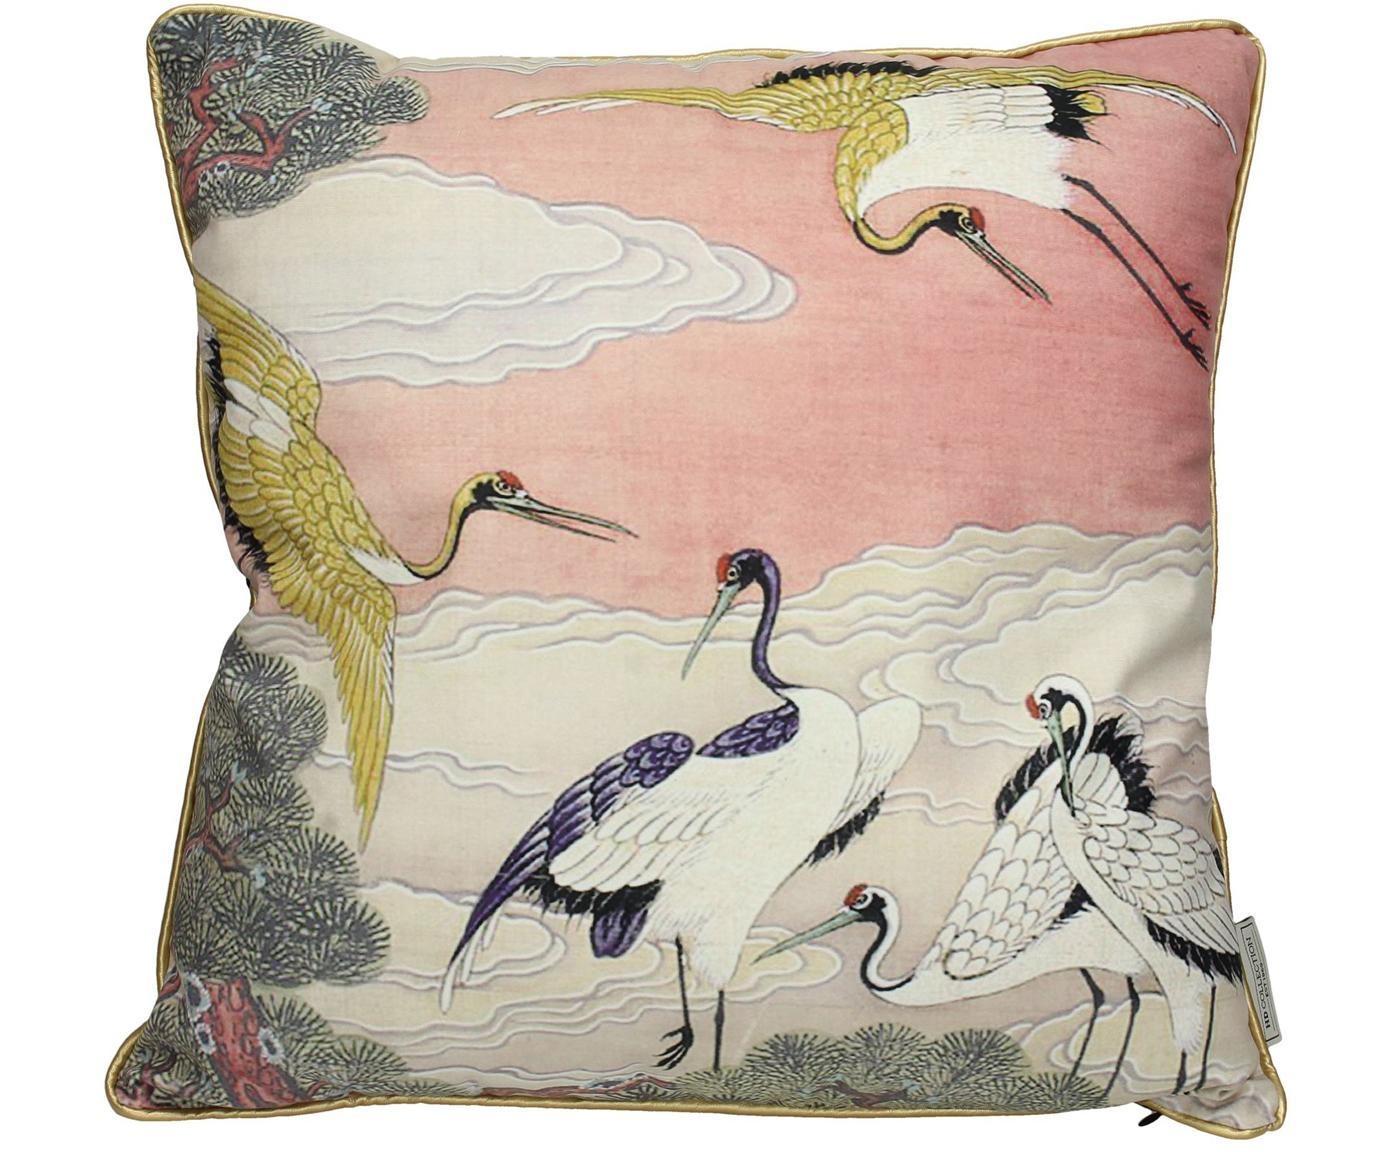 Cojín de terciopelo Storcks, con relleno, 100%terciopelo de poliéster, Multicolor, An 45 x L 45 cm